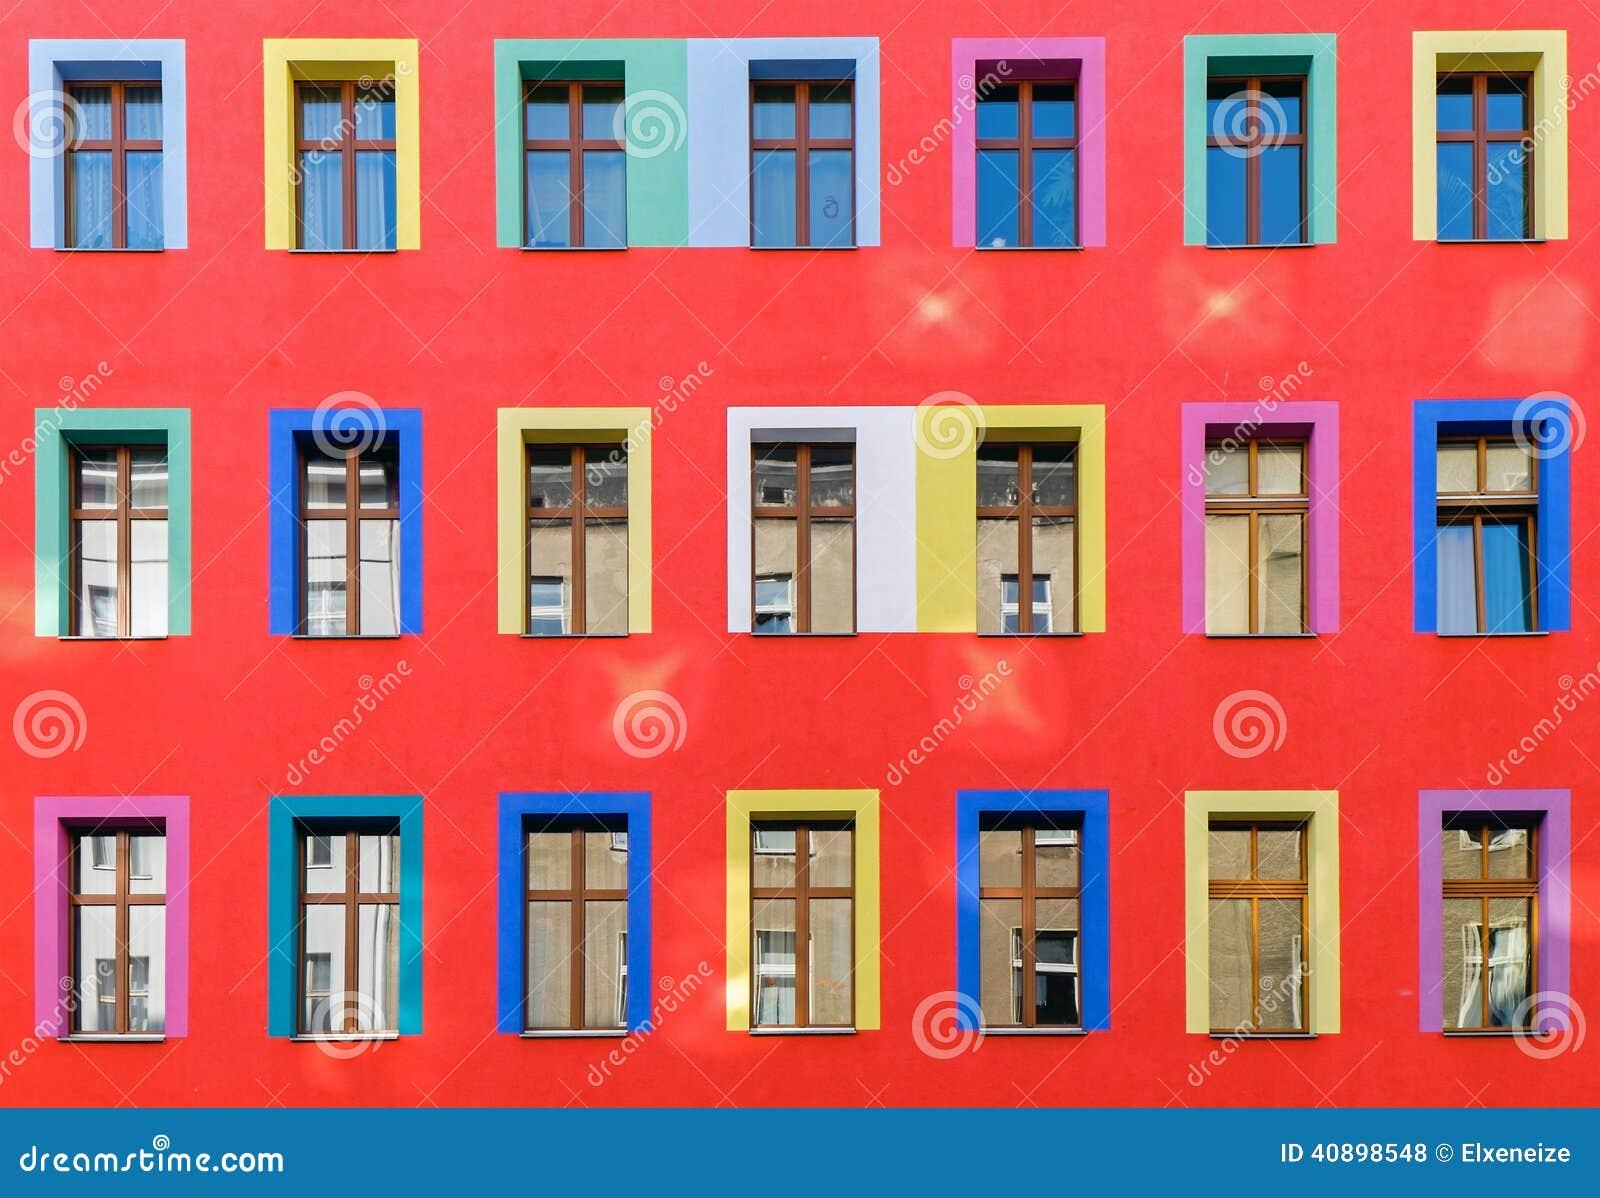 rote fassade mit bunten fenstern stockfoto bild 40898548. Black Bedroom Furniture Sets. Home Design Ideas